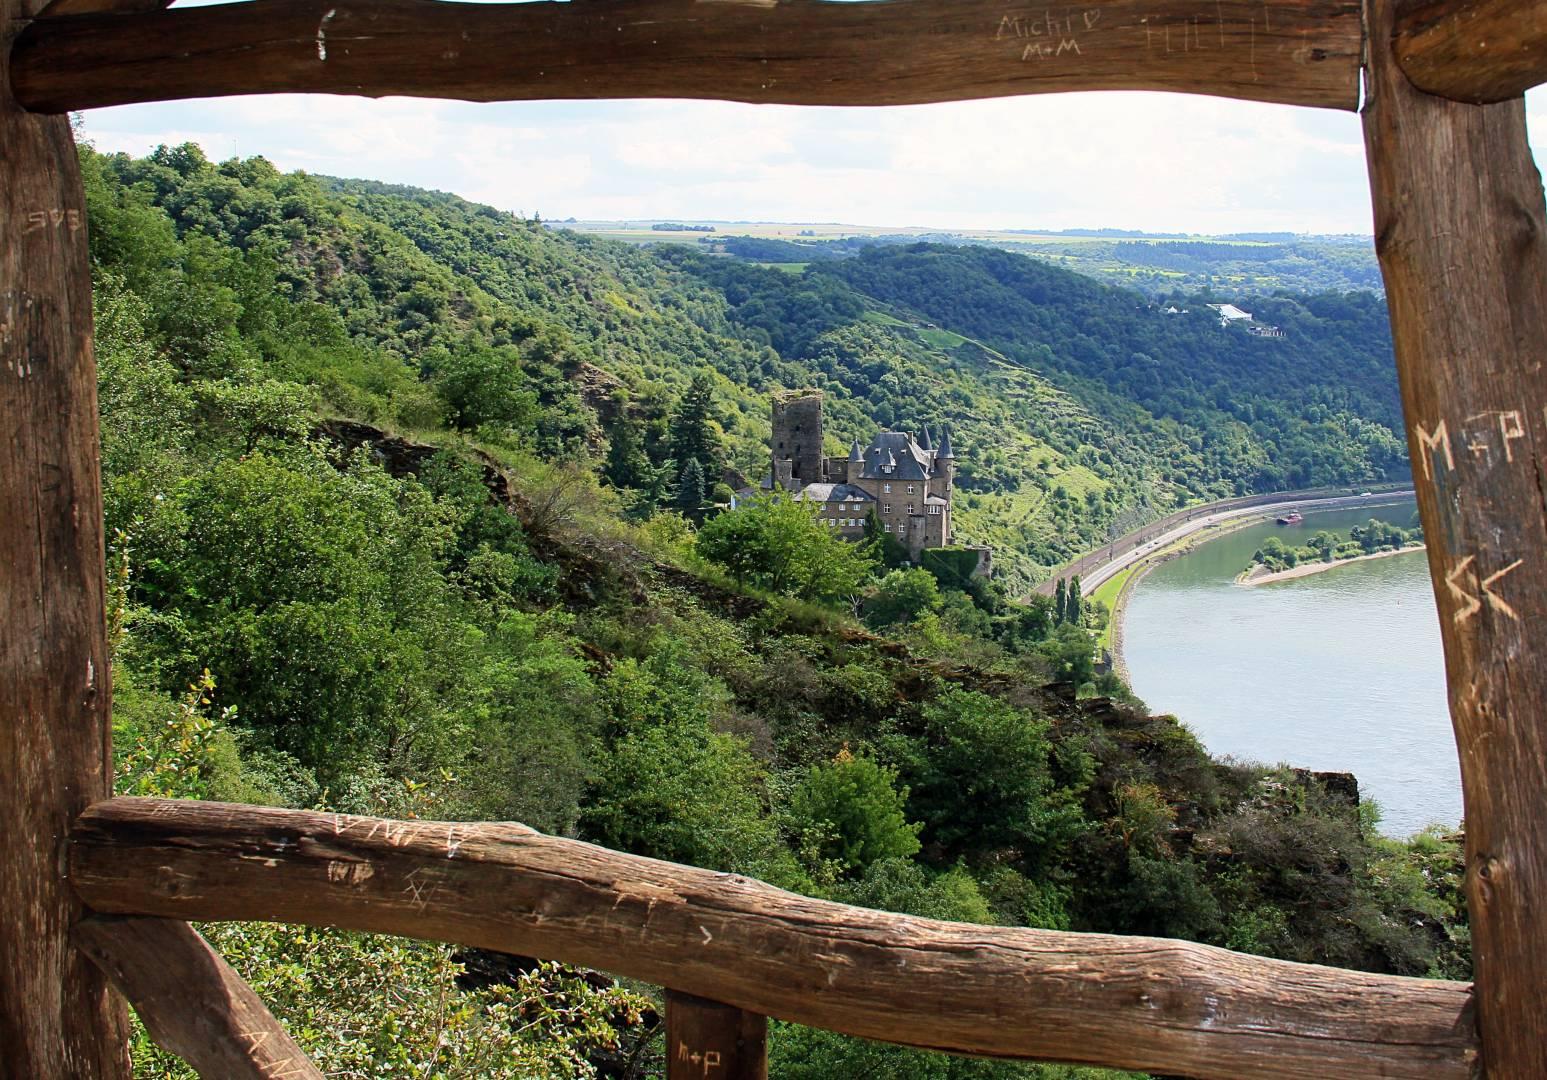 Holland Trip Photo Diary: Day 2 - Rhine